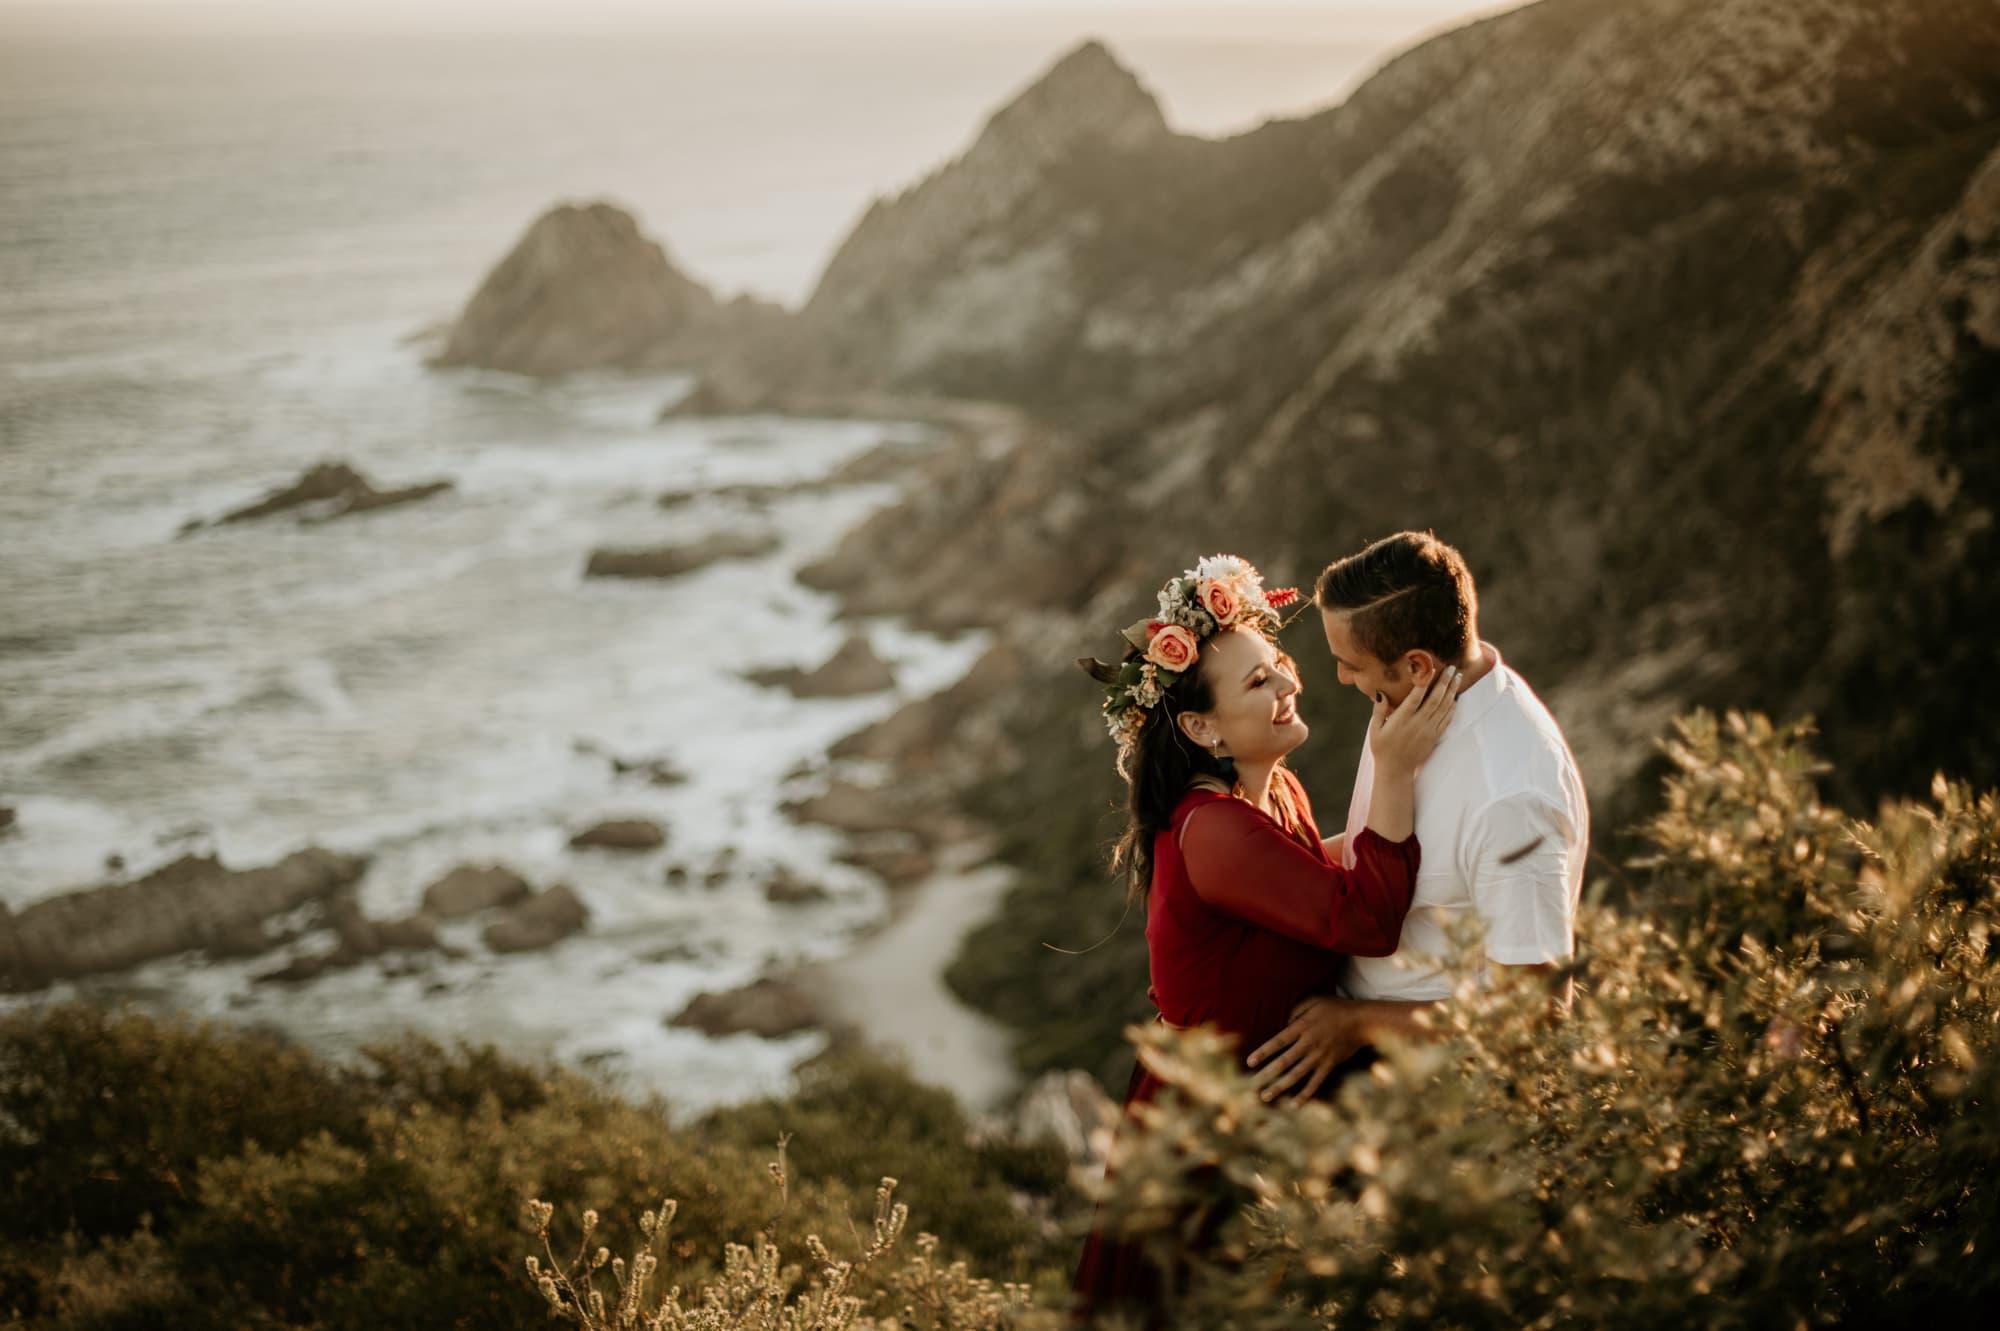 jesann-freddie-kranshoek-engagement-June-Richards-Photography-Destination-Weddings-Elopements-Garden-Route-50